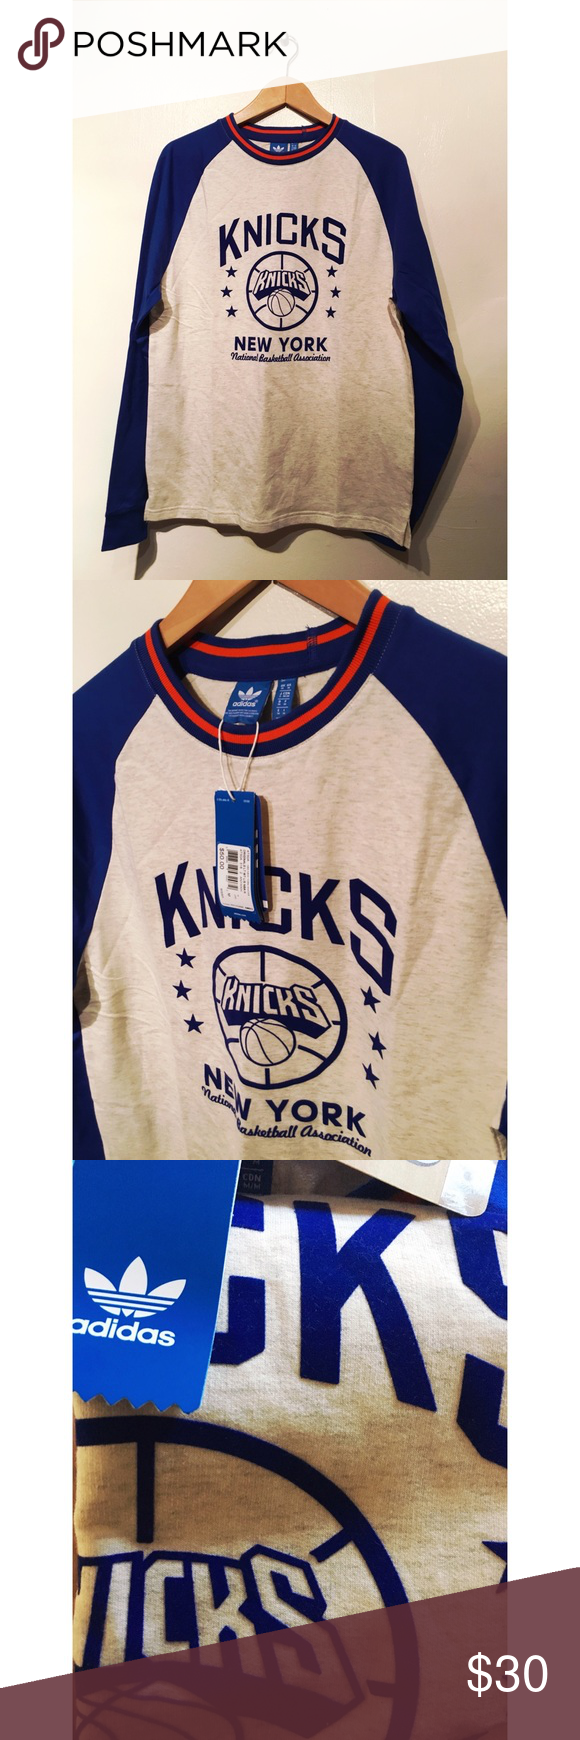 NWT Adidas Adidas 10632 NBA New York manga Knicks camiseta de manga larga NWT   b4cc4b7 - allpoints.host